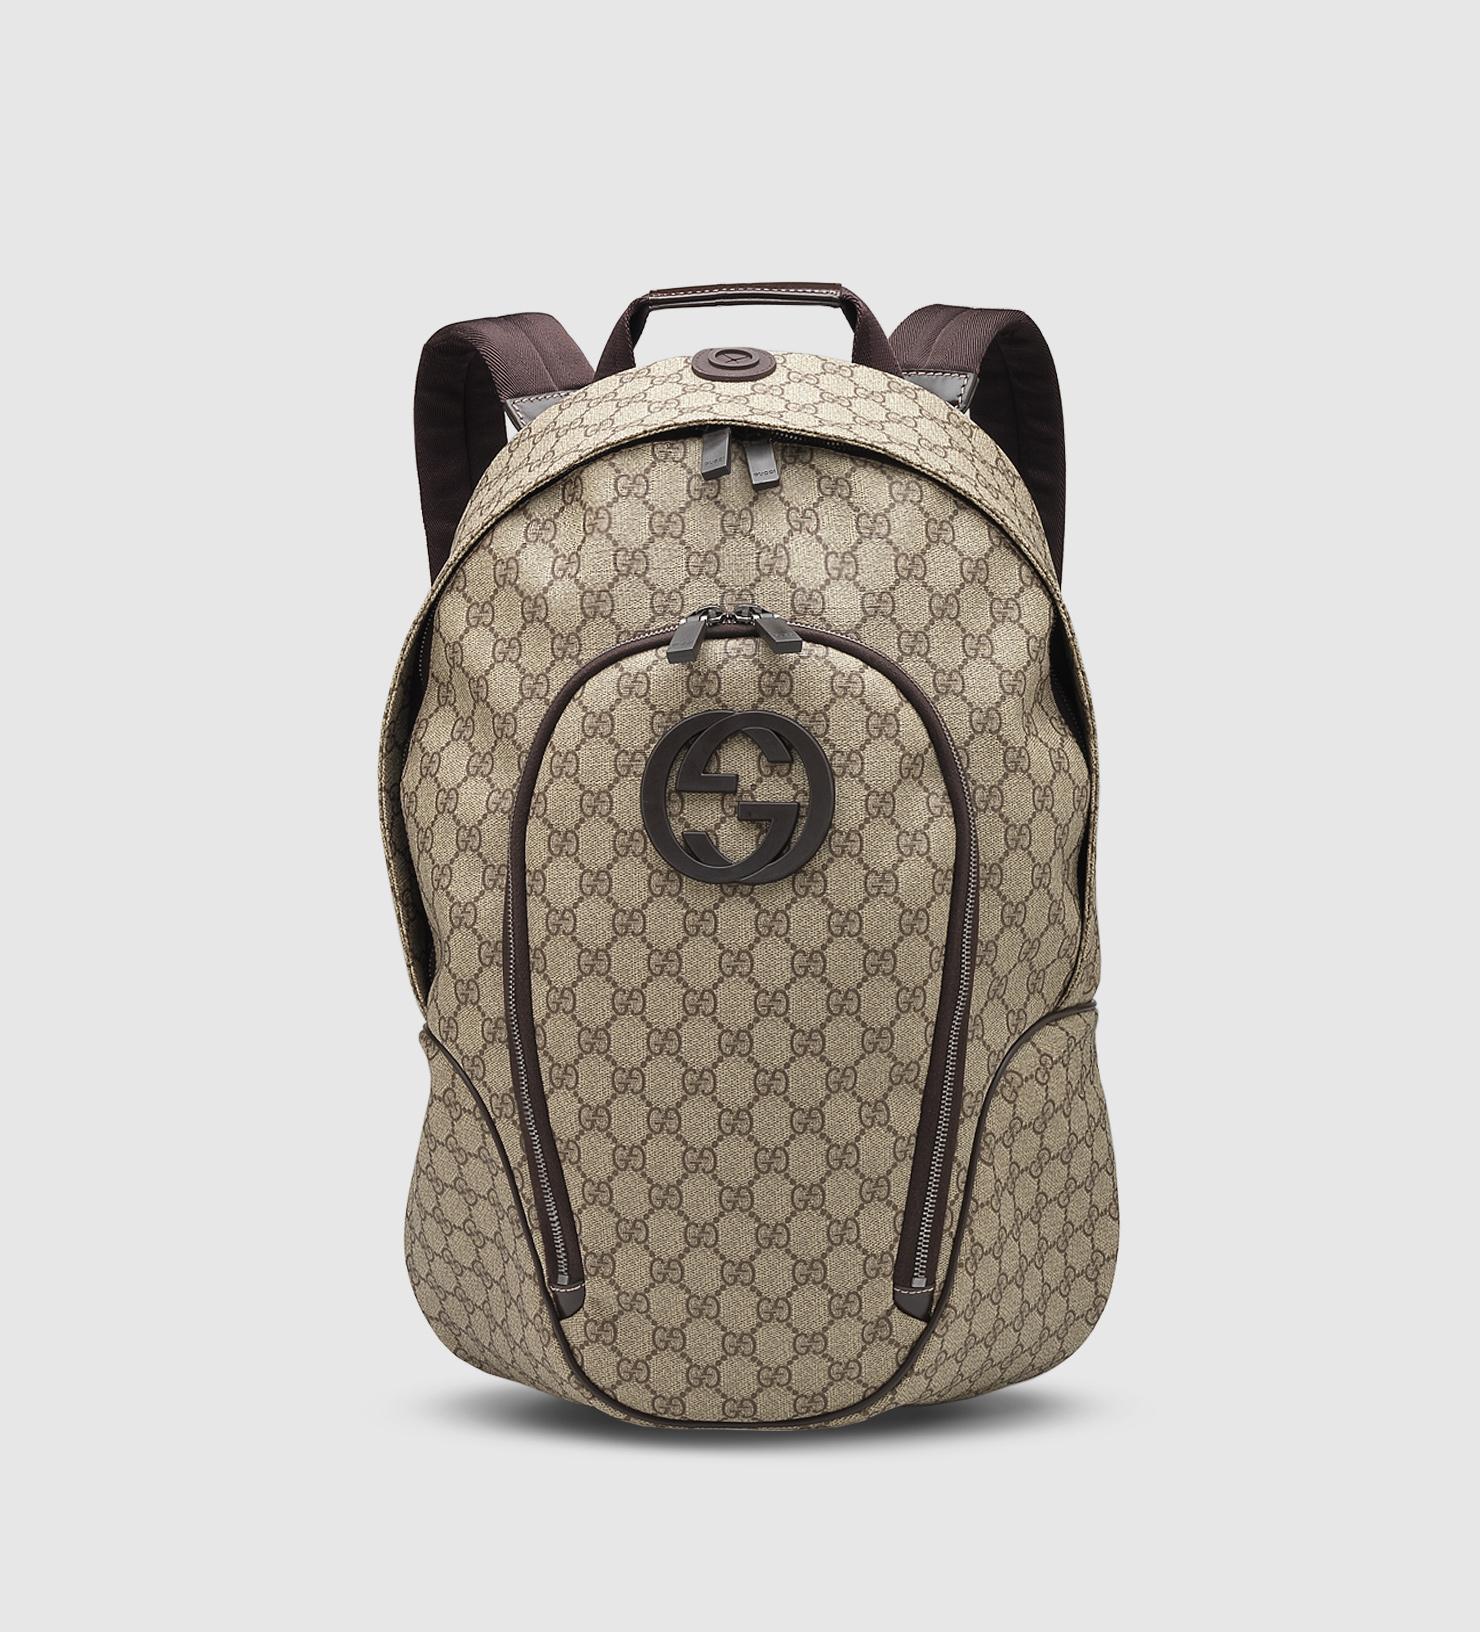 ... authentic faff7 87e06 Lyst - Gucci Gg Supreme Canvas Interlocking G  Backpack in Na ... 1ea0a1c584